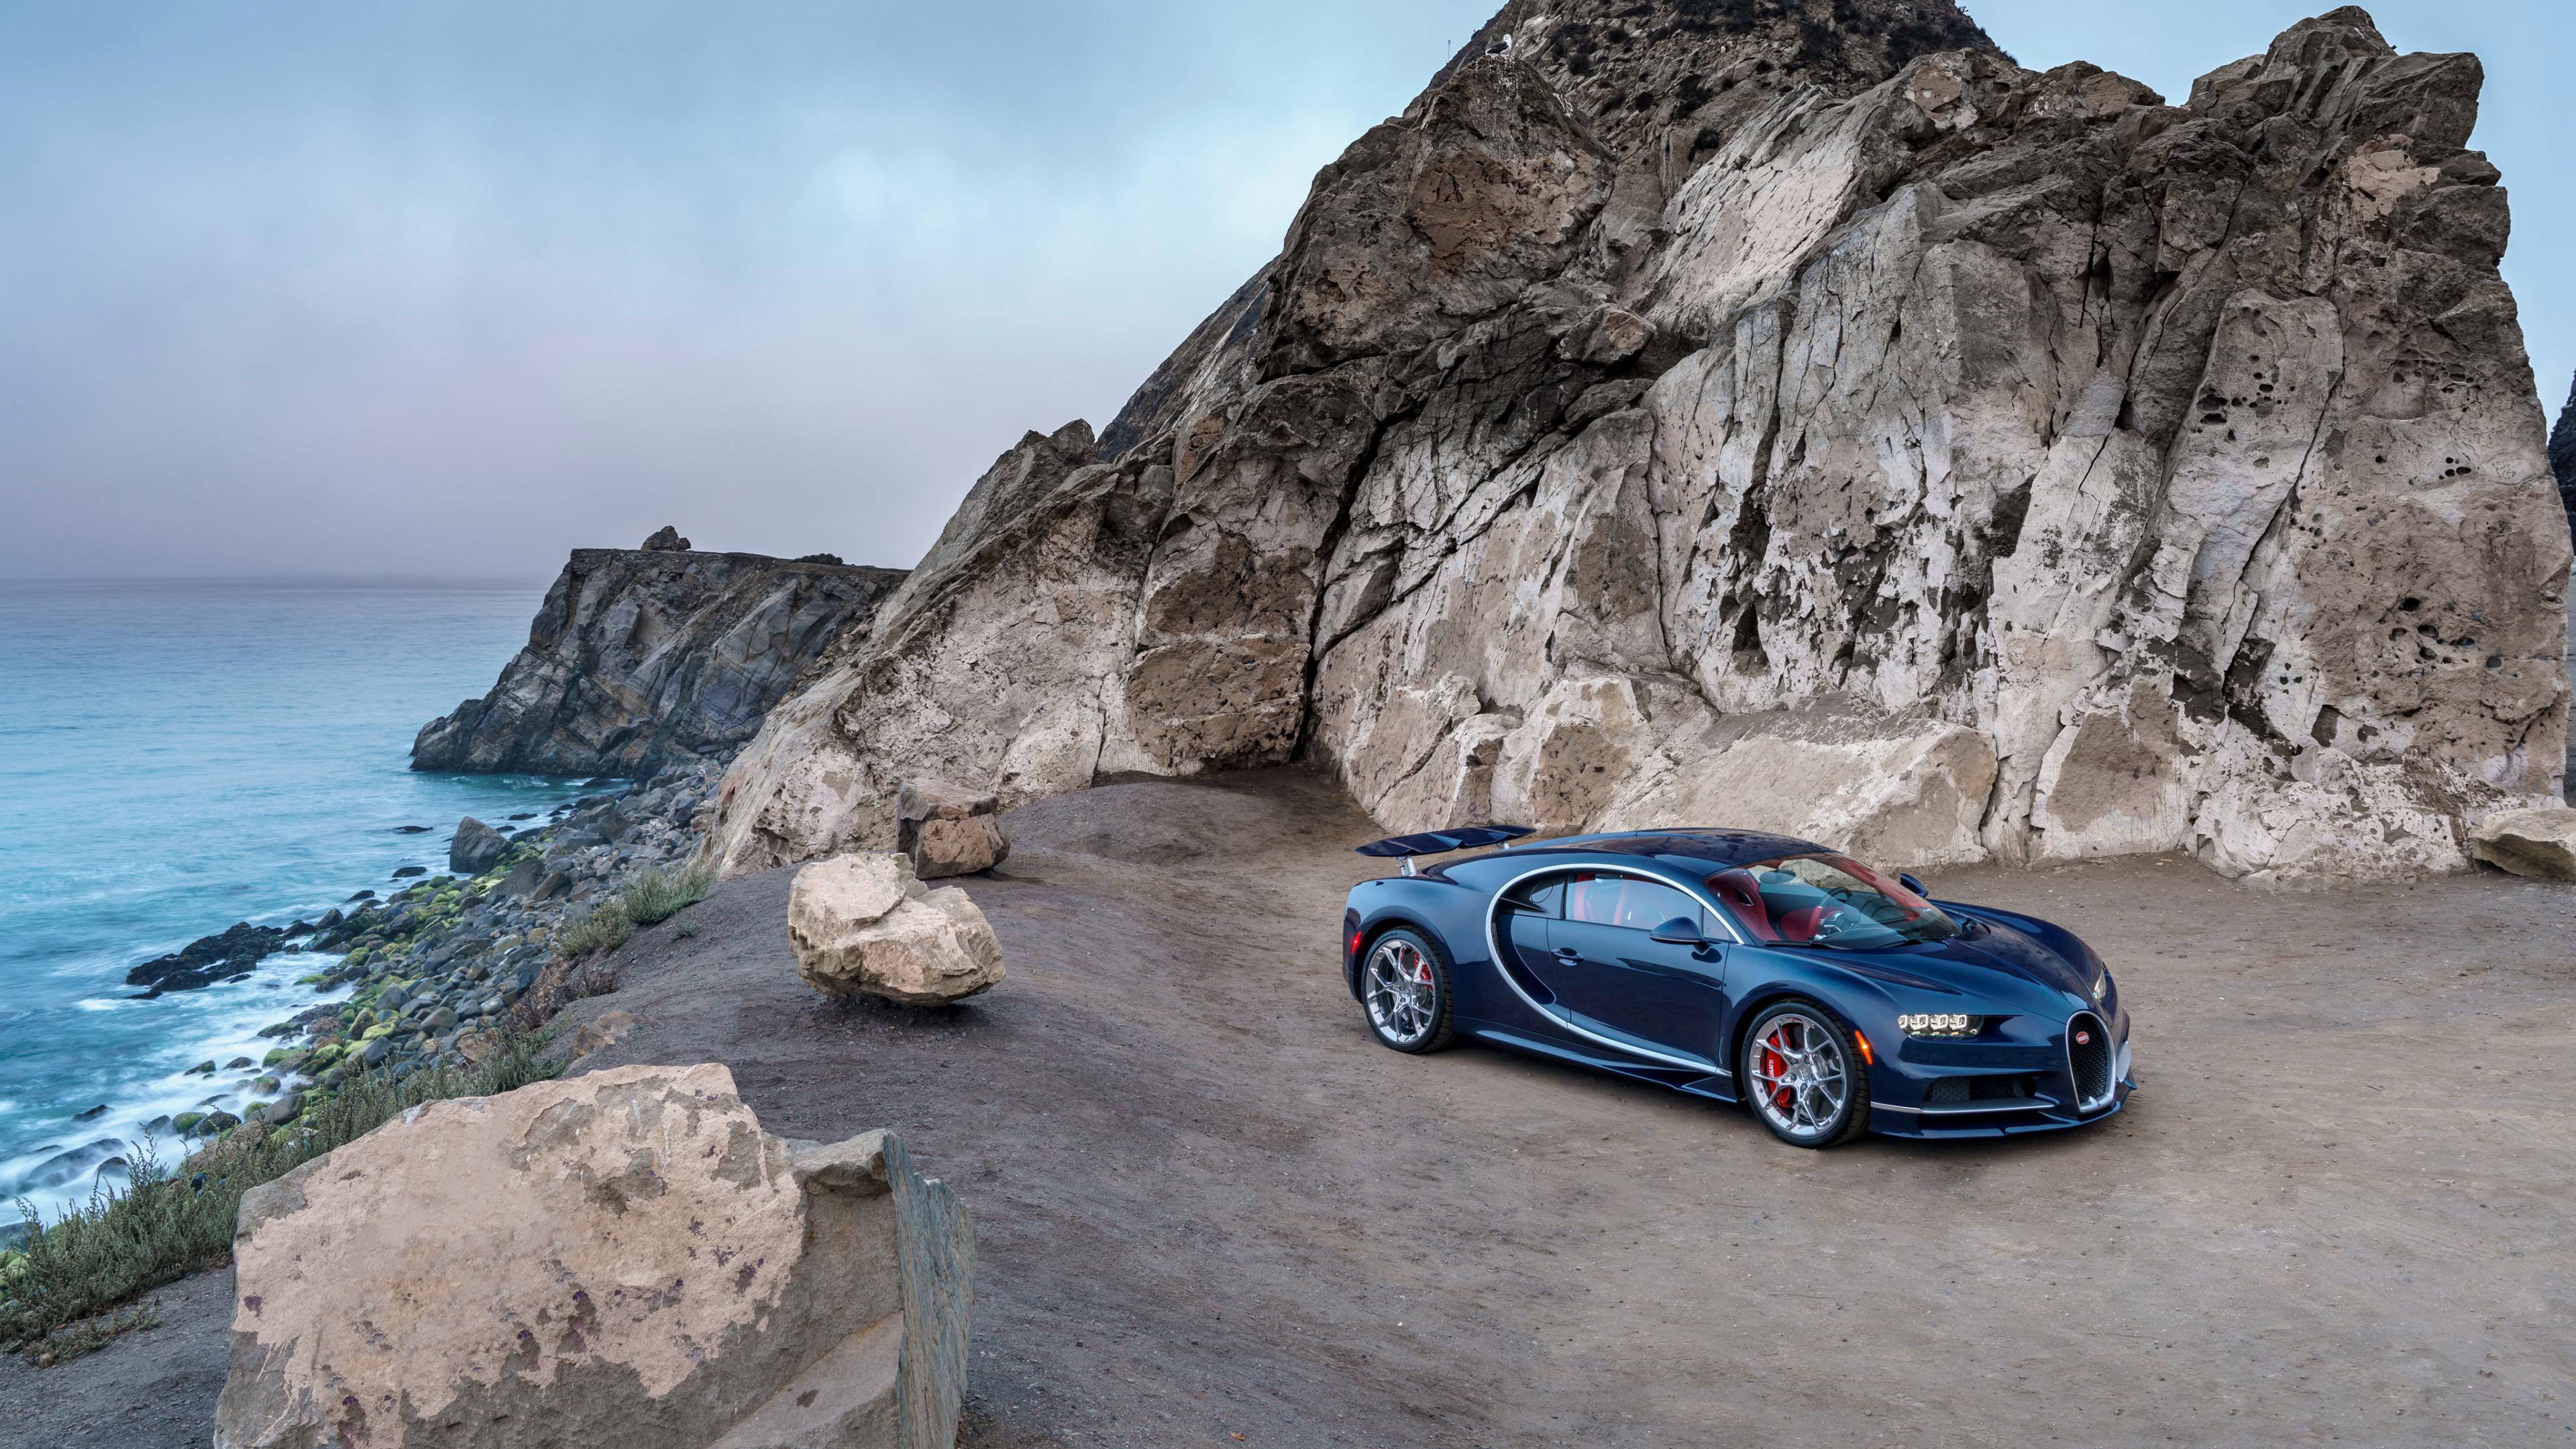 Темно-синий спортивный автомобиль